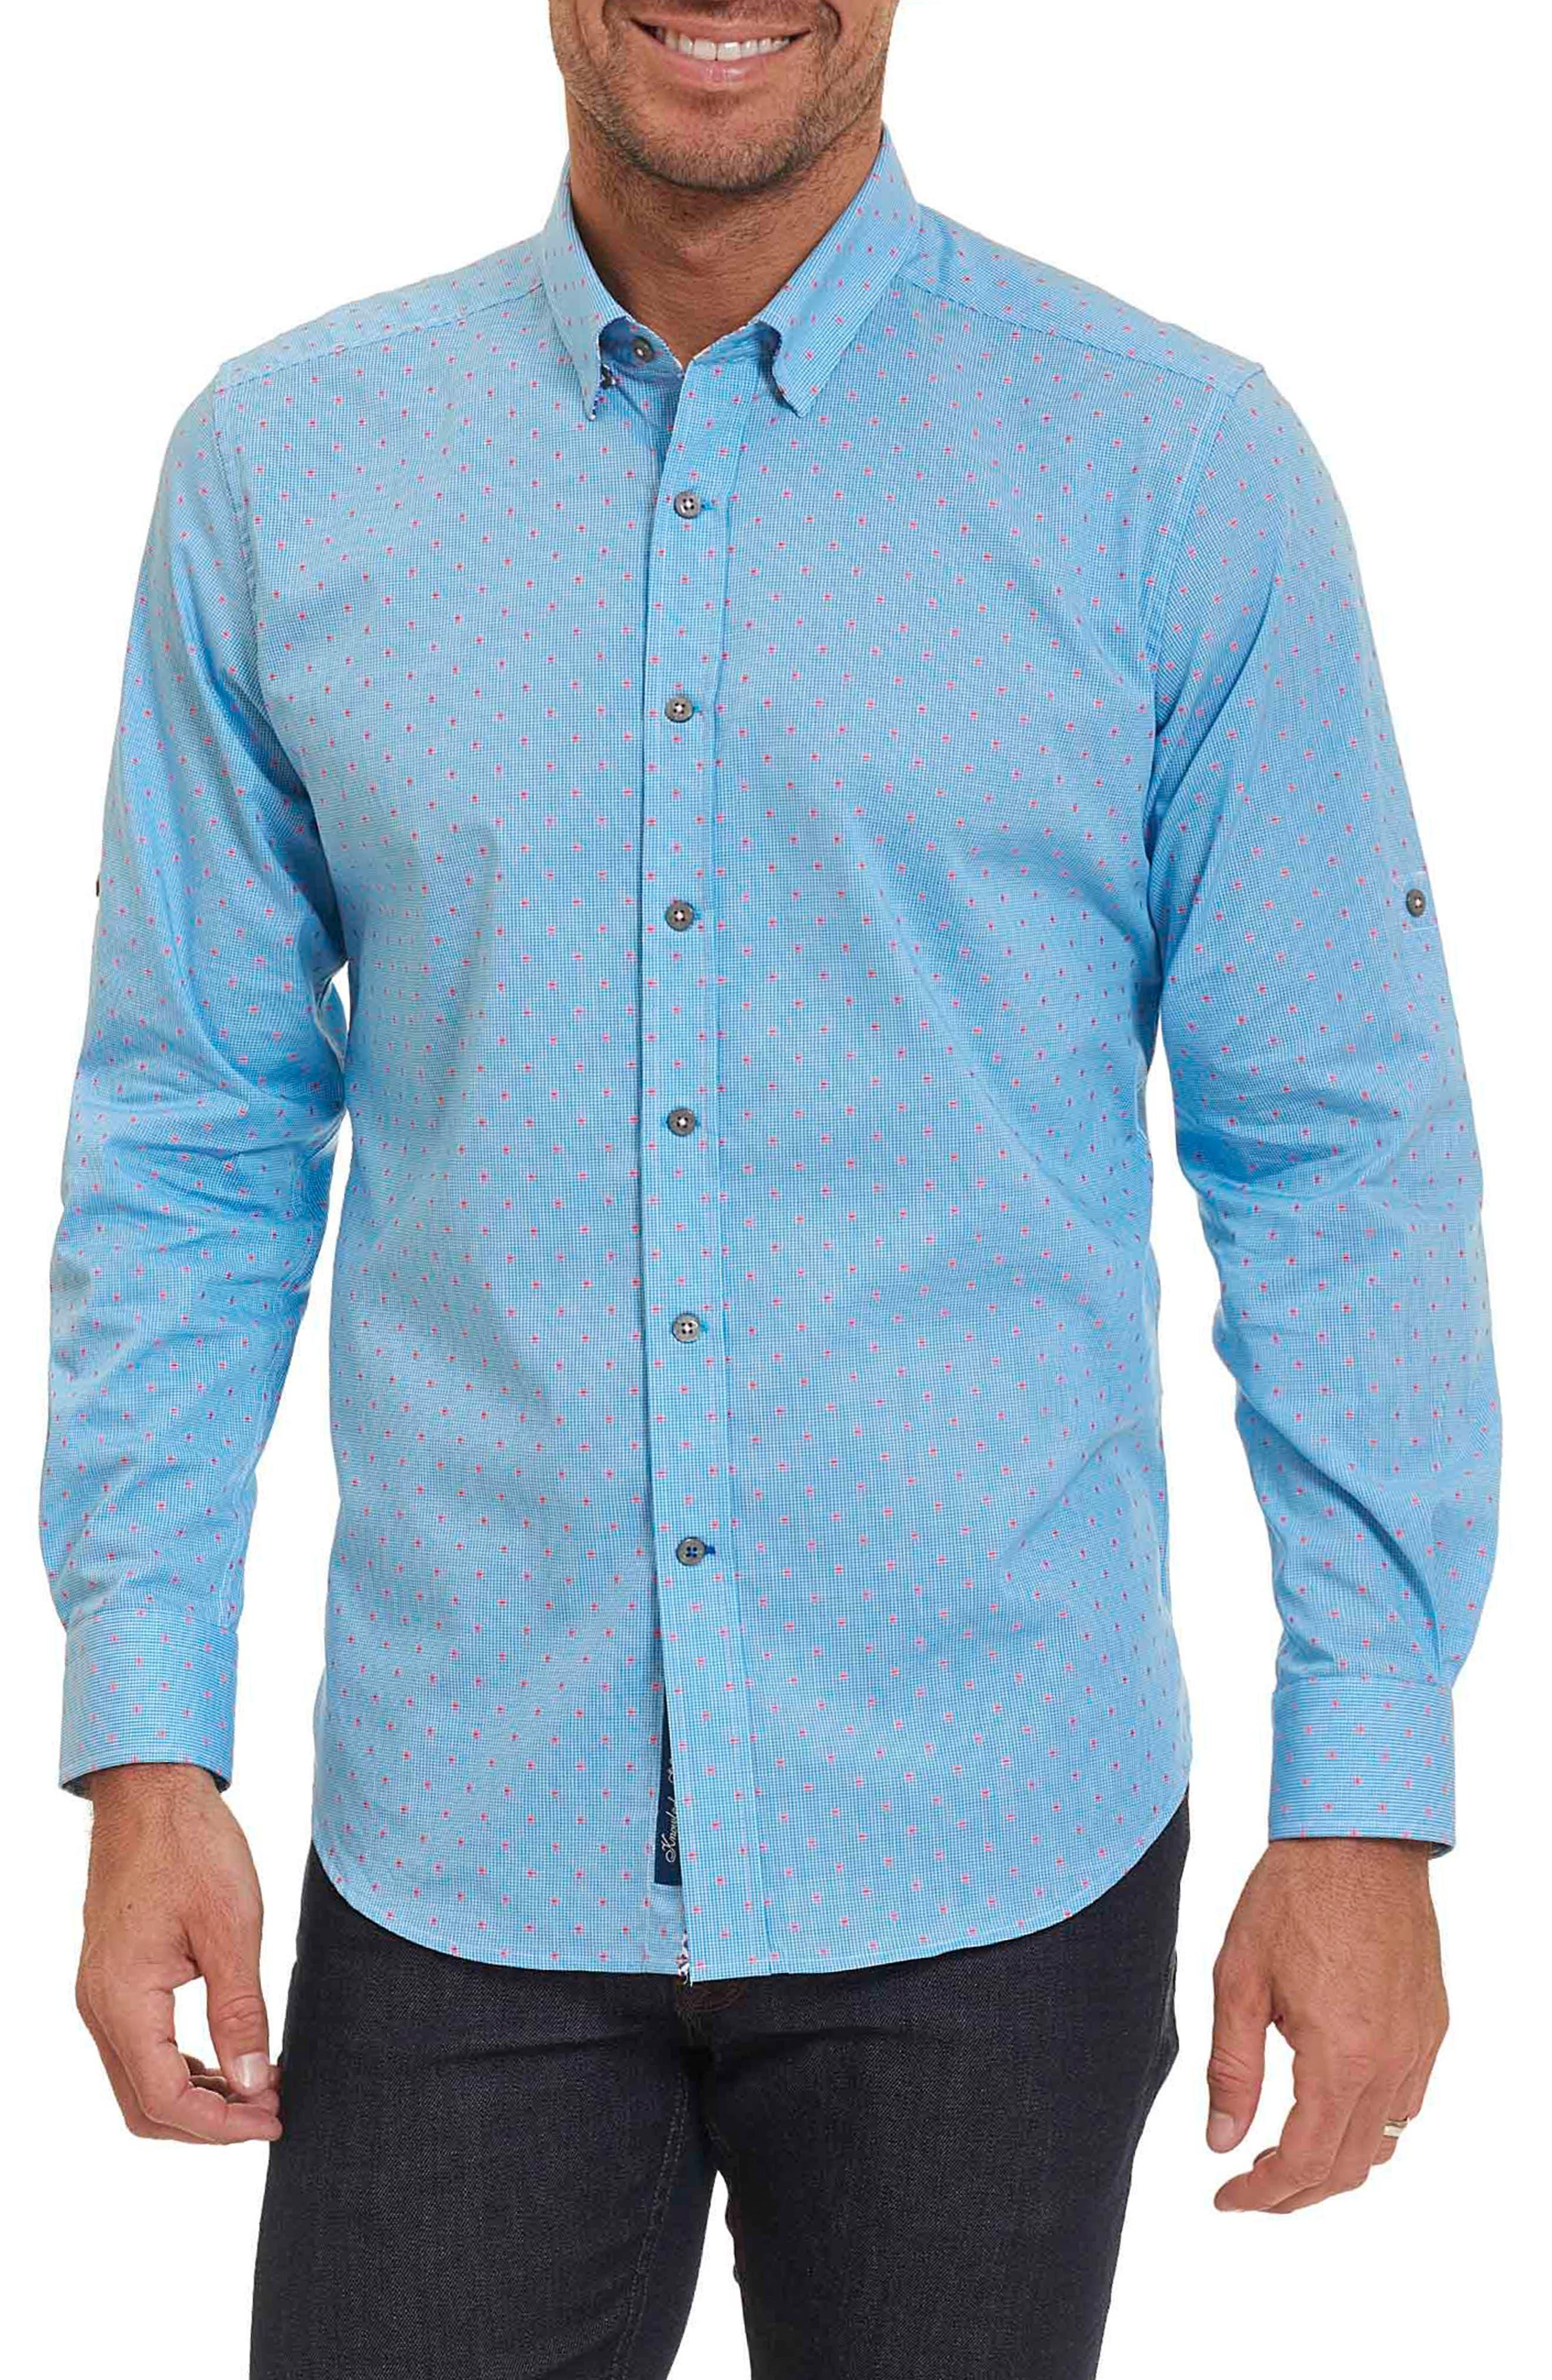 Alternate Image 1 Selected - Robert Graham Tailored Fit Houndstooth Sport Shirt